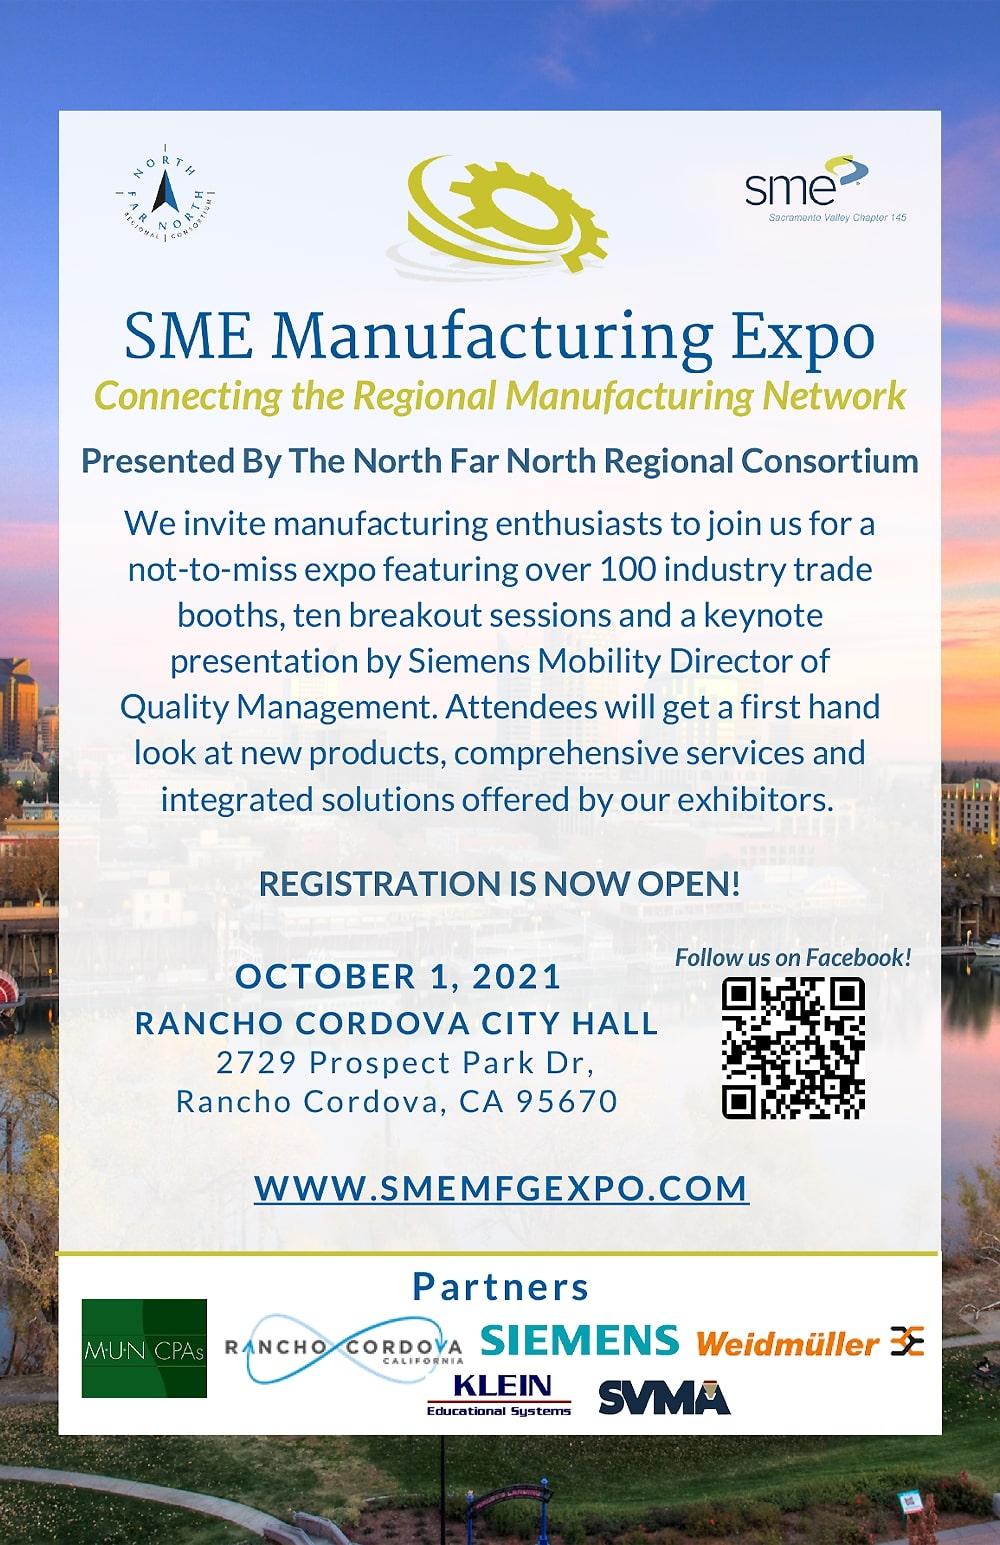 SVMFGIw-SME-Expo-Invitation-05242021